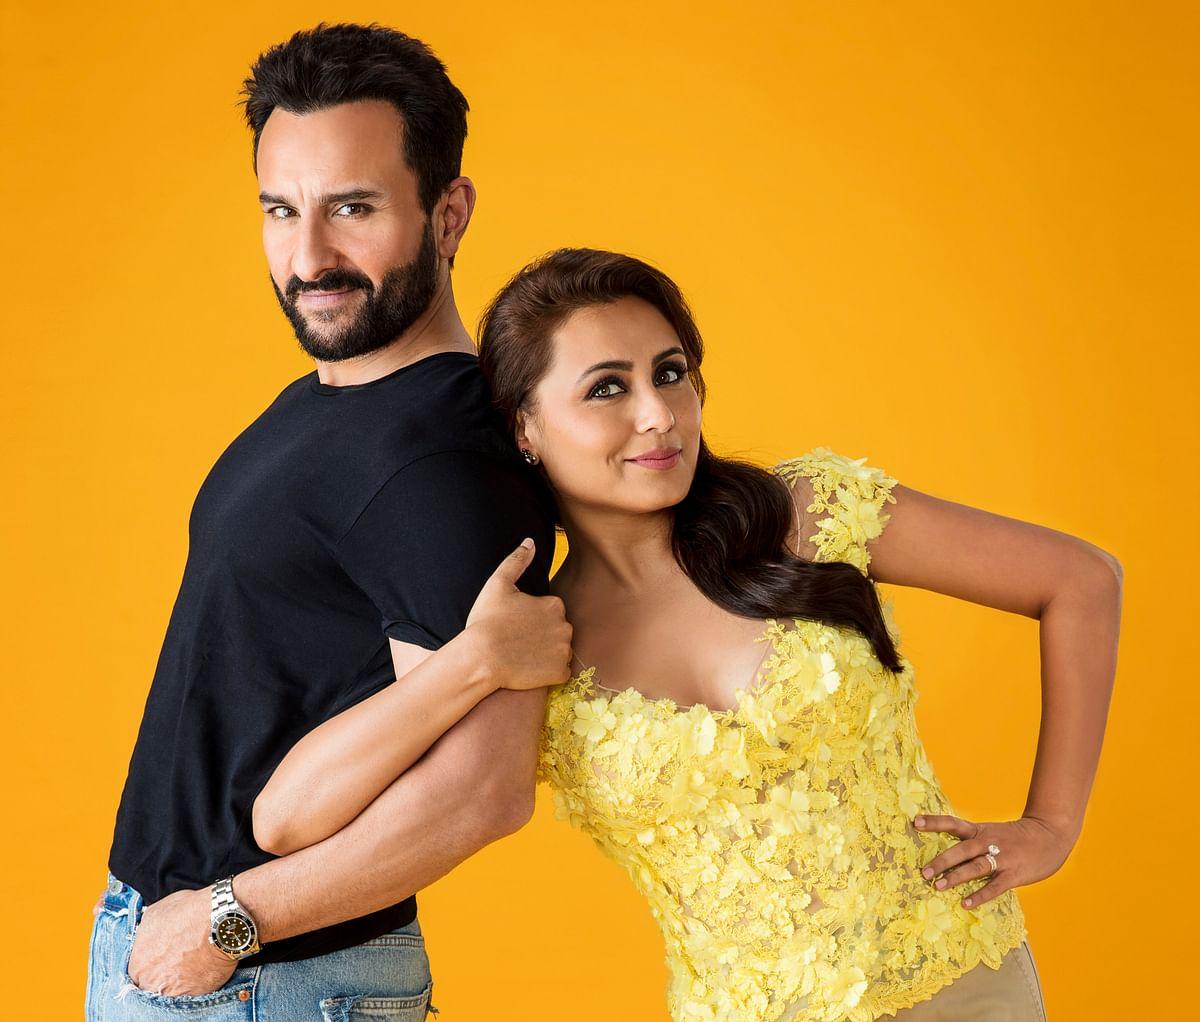 Saif and Rani to Reunite After 11 Years for 'Bunty Aur Babli 2'